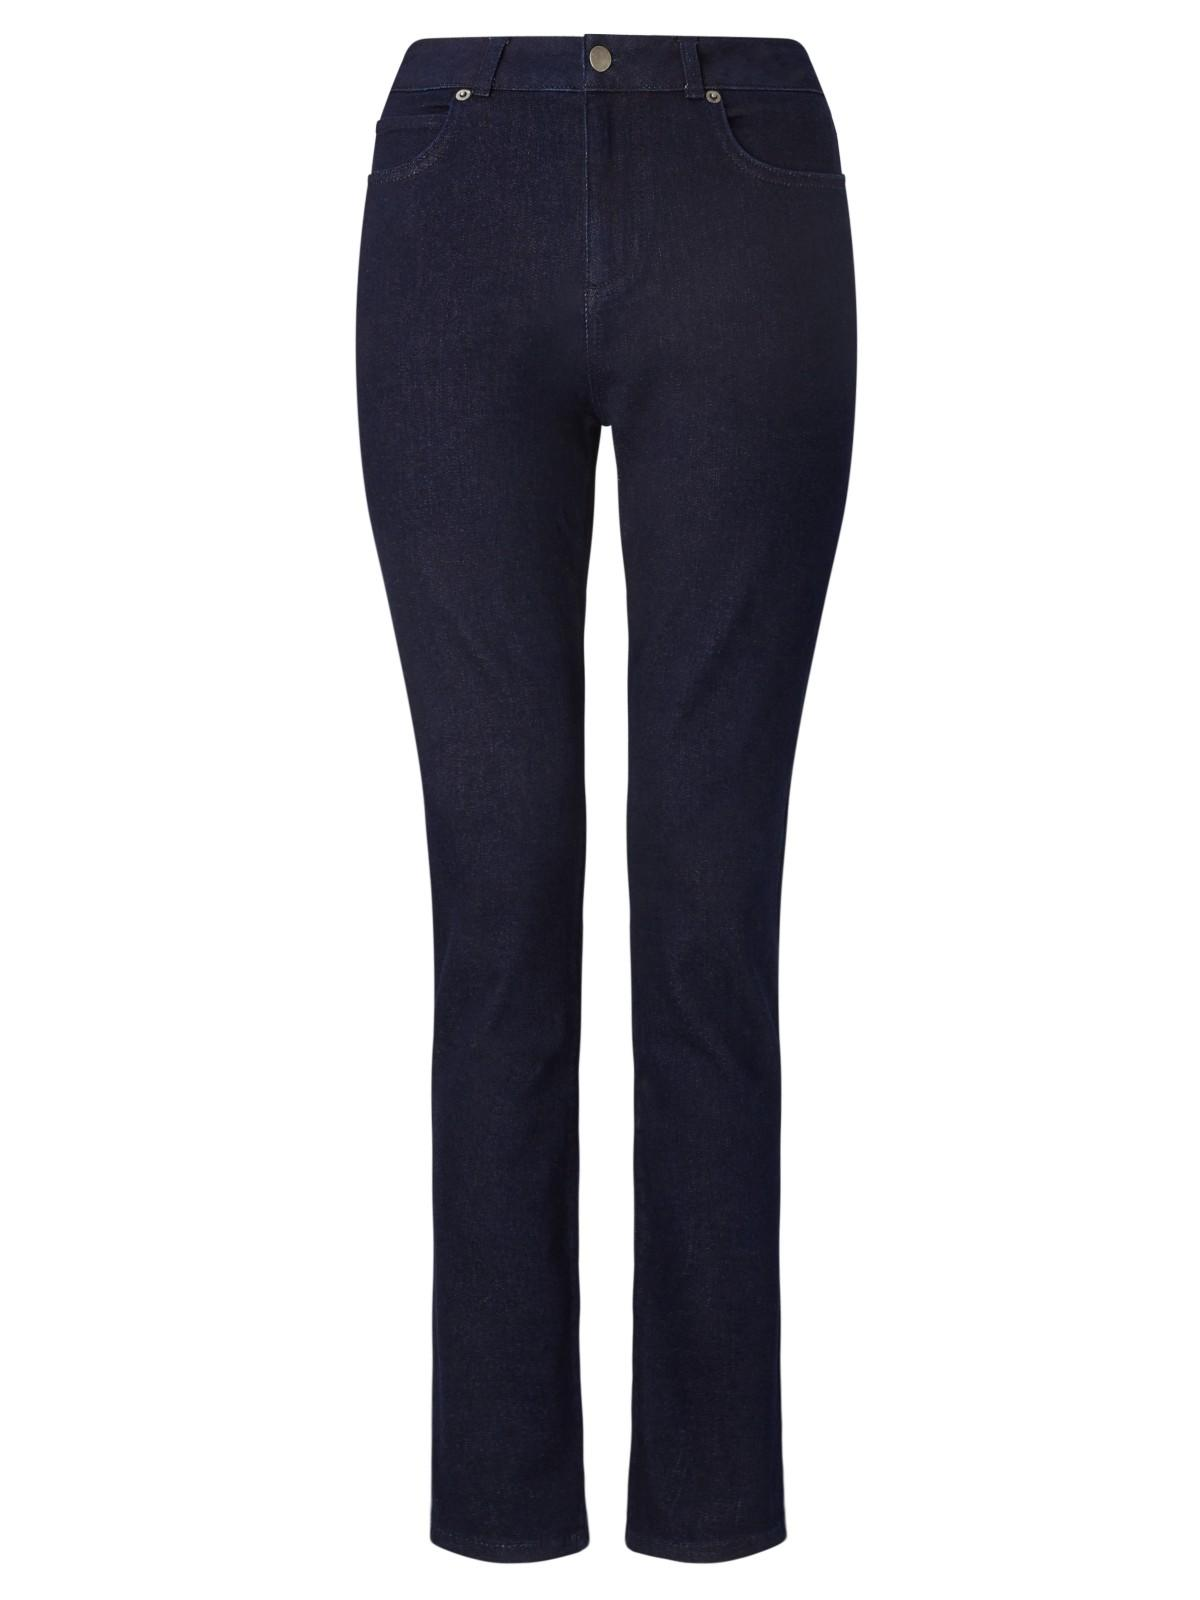 John Lewis Denim Straight Leg Jeans in Indigo (Blue)